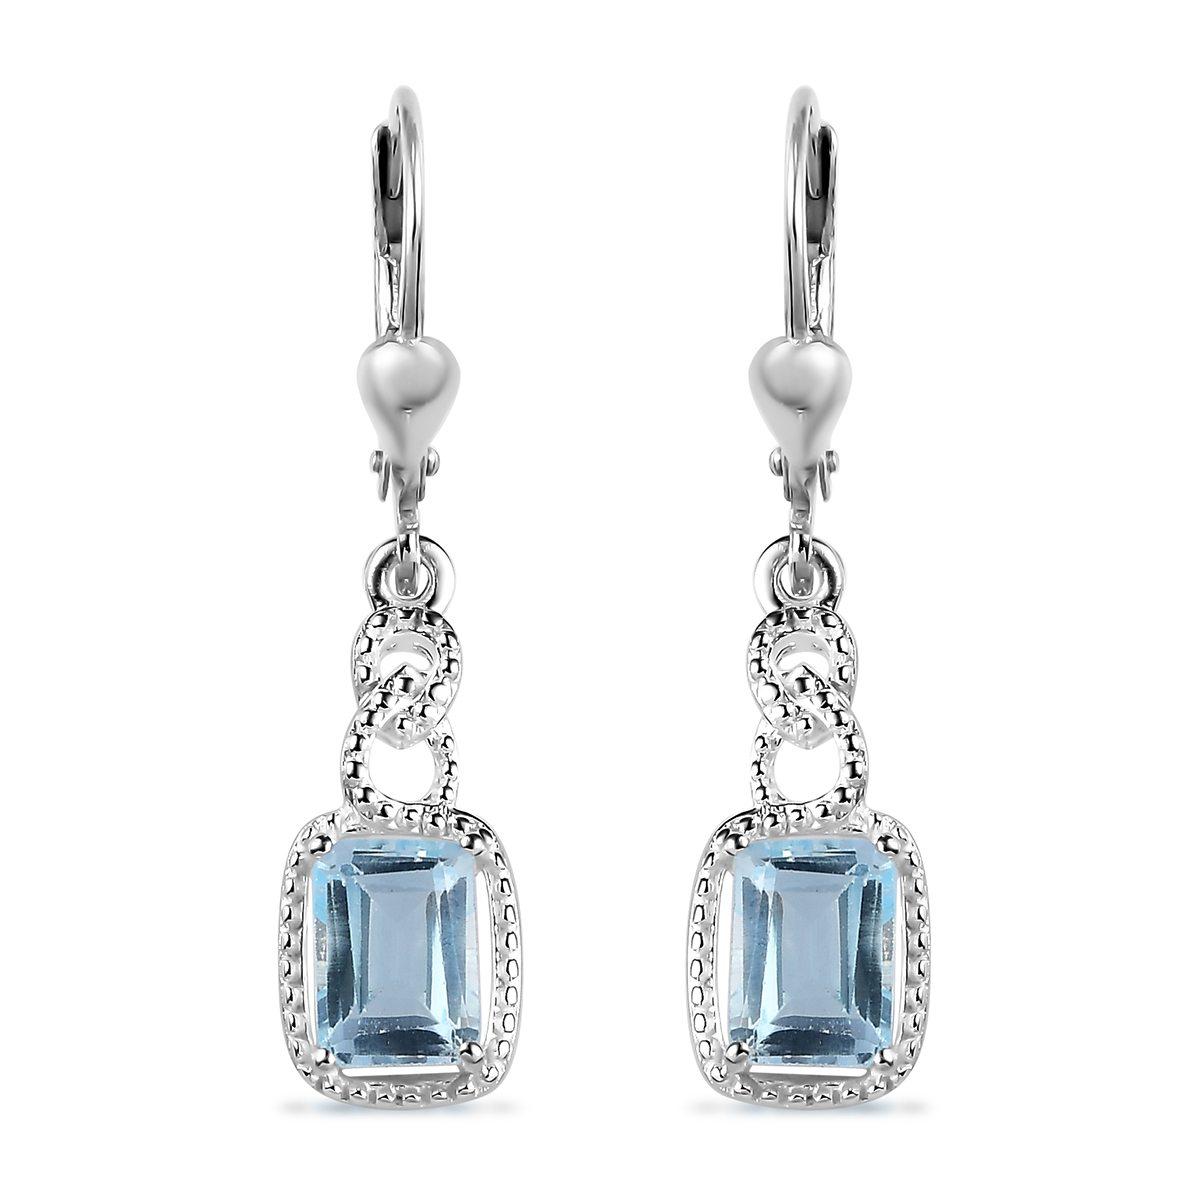 a8b6eb4e9 Details about Sky Blue Topaz Dangle Drop Earrings Octagon 925 Sterling  Silver Jewelry